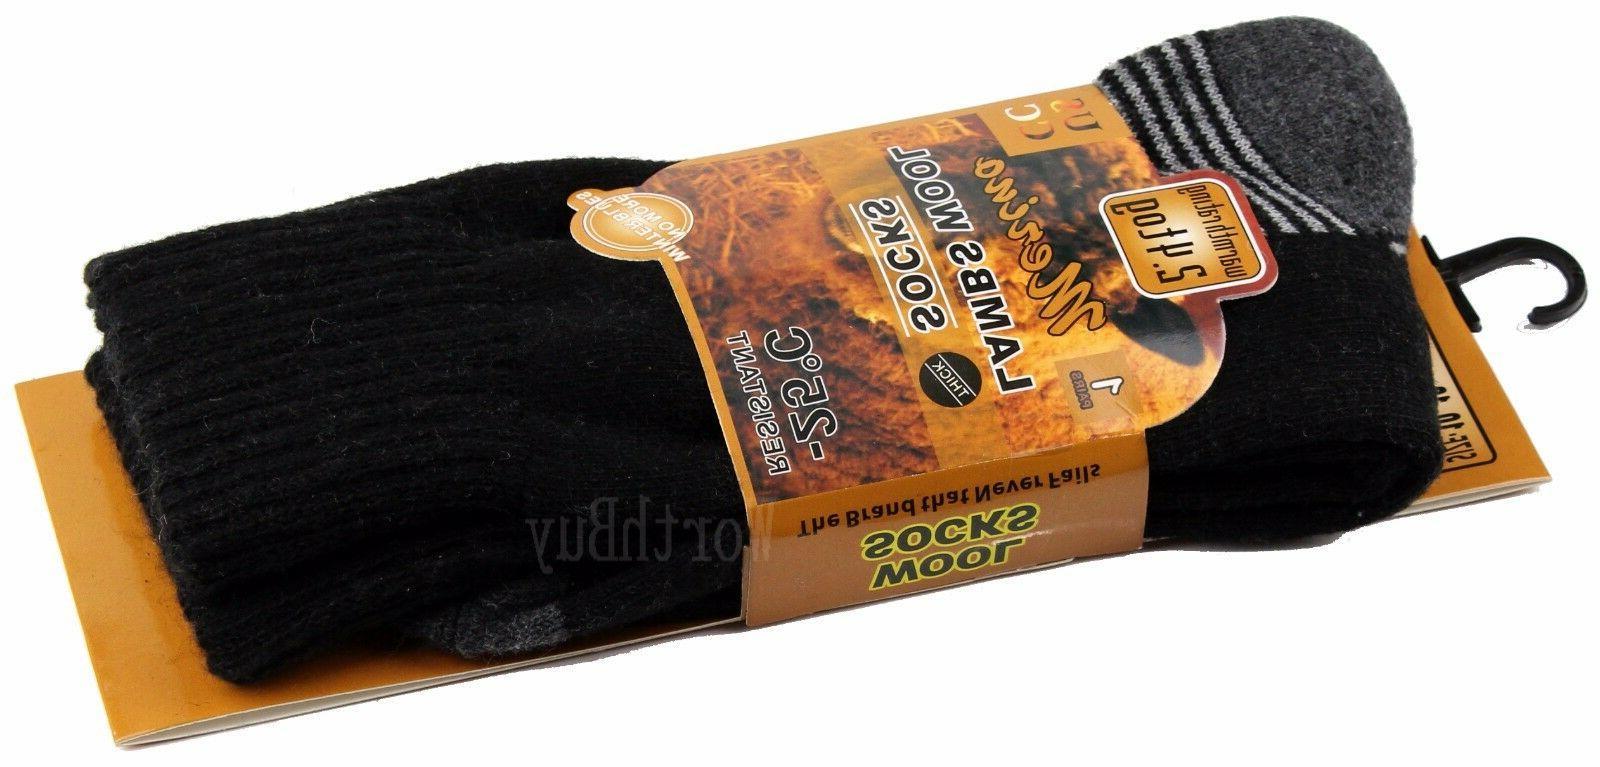 Lot Heavy Duty Winter Merino Lambs Boots Thermal Socks